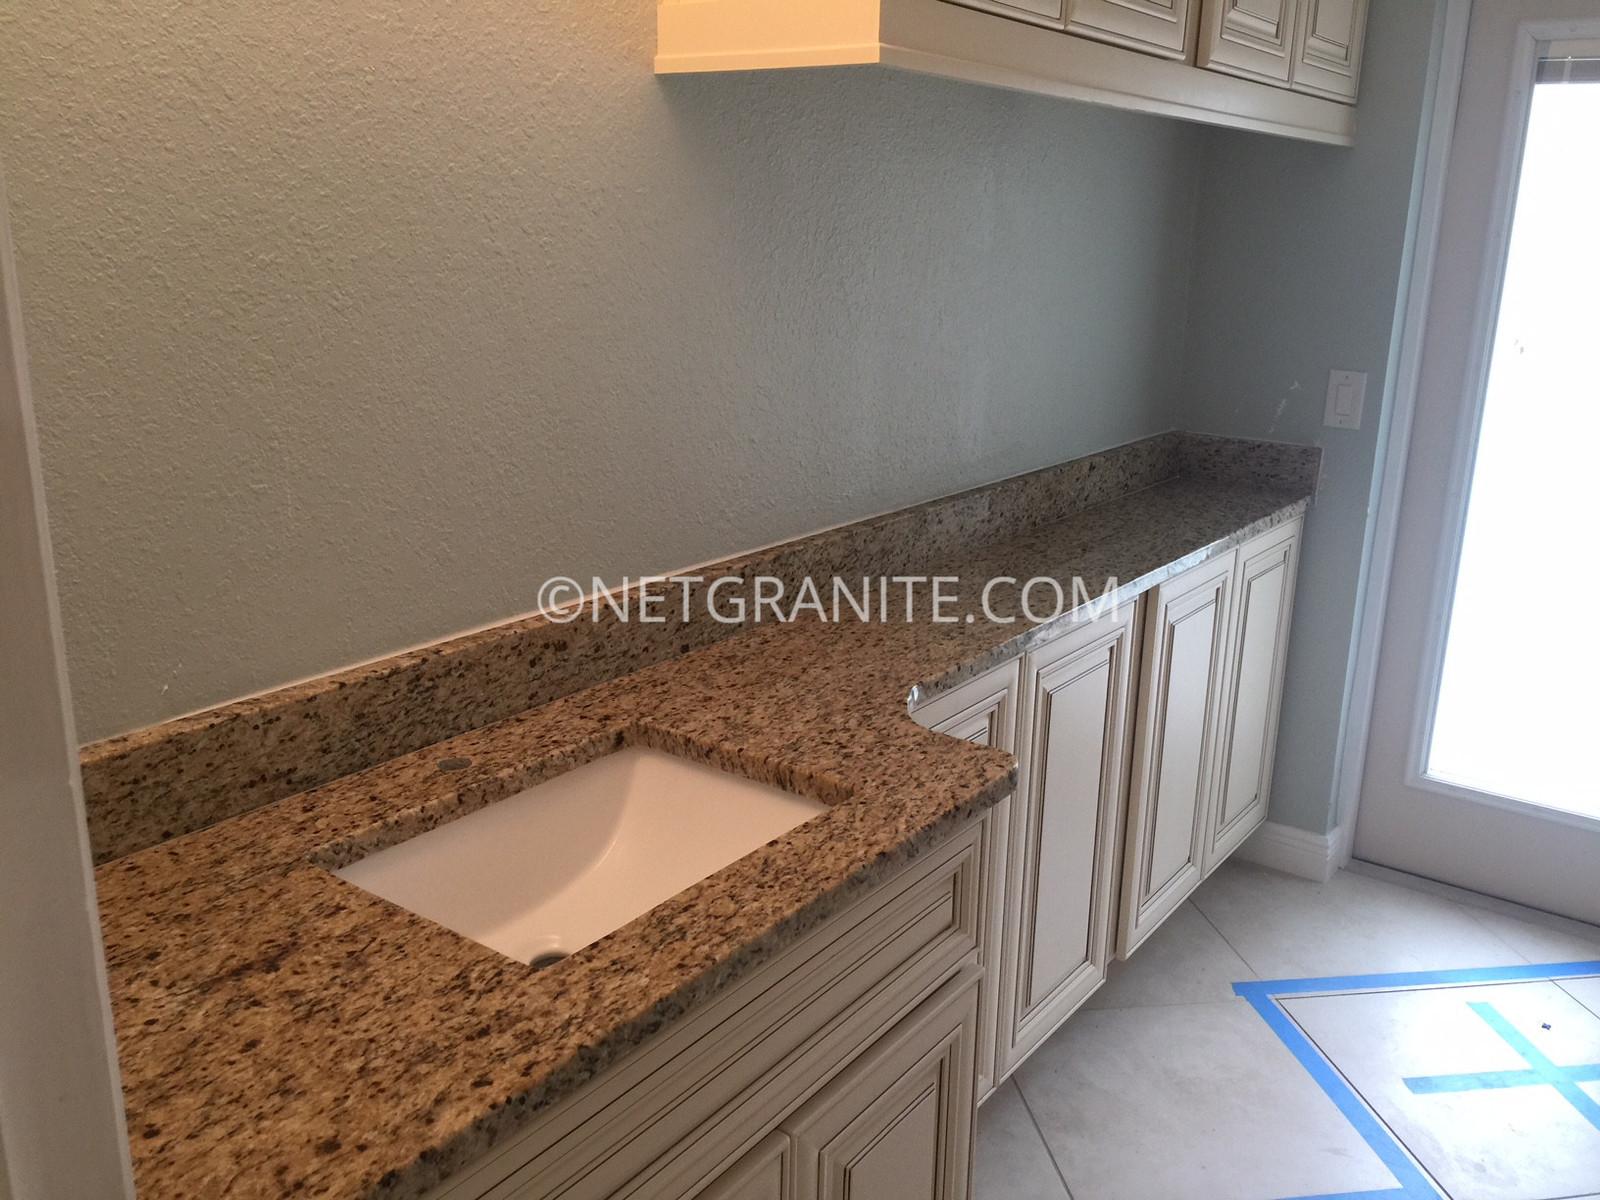 Granite Vanity Counter